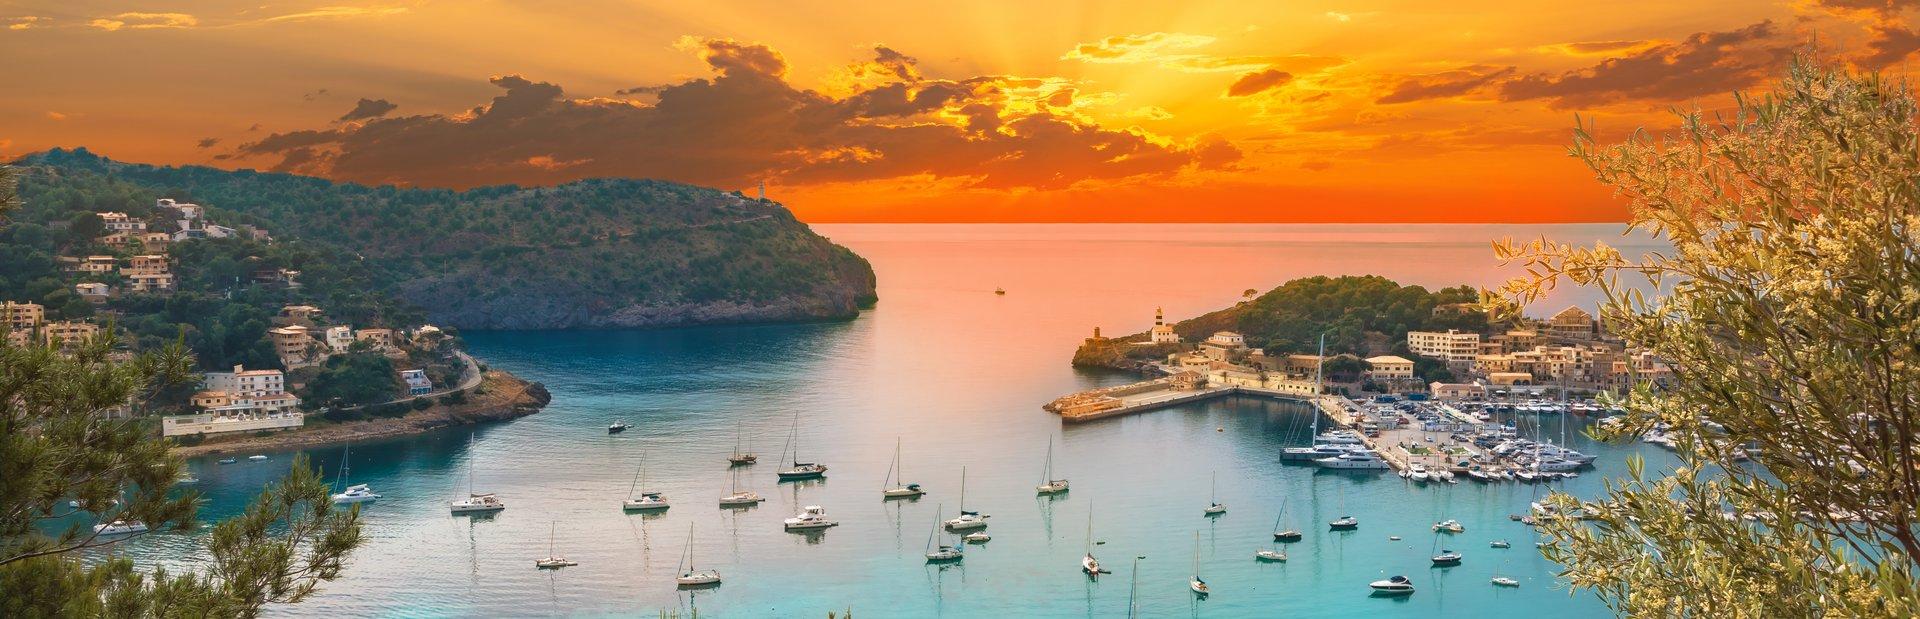 The Balearics photo tour